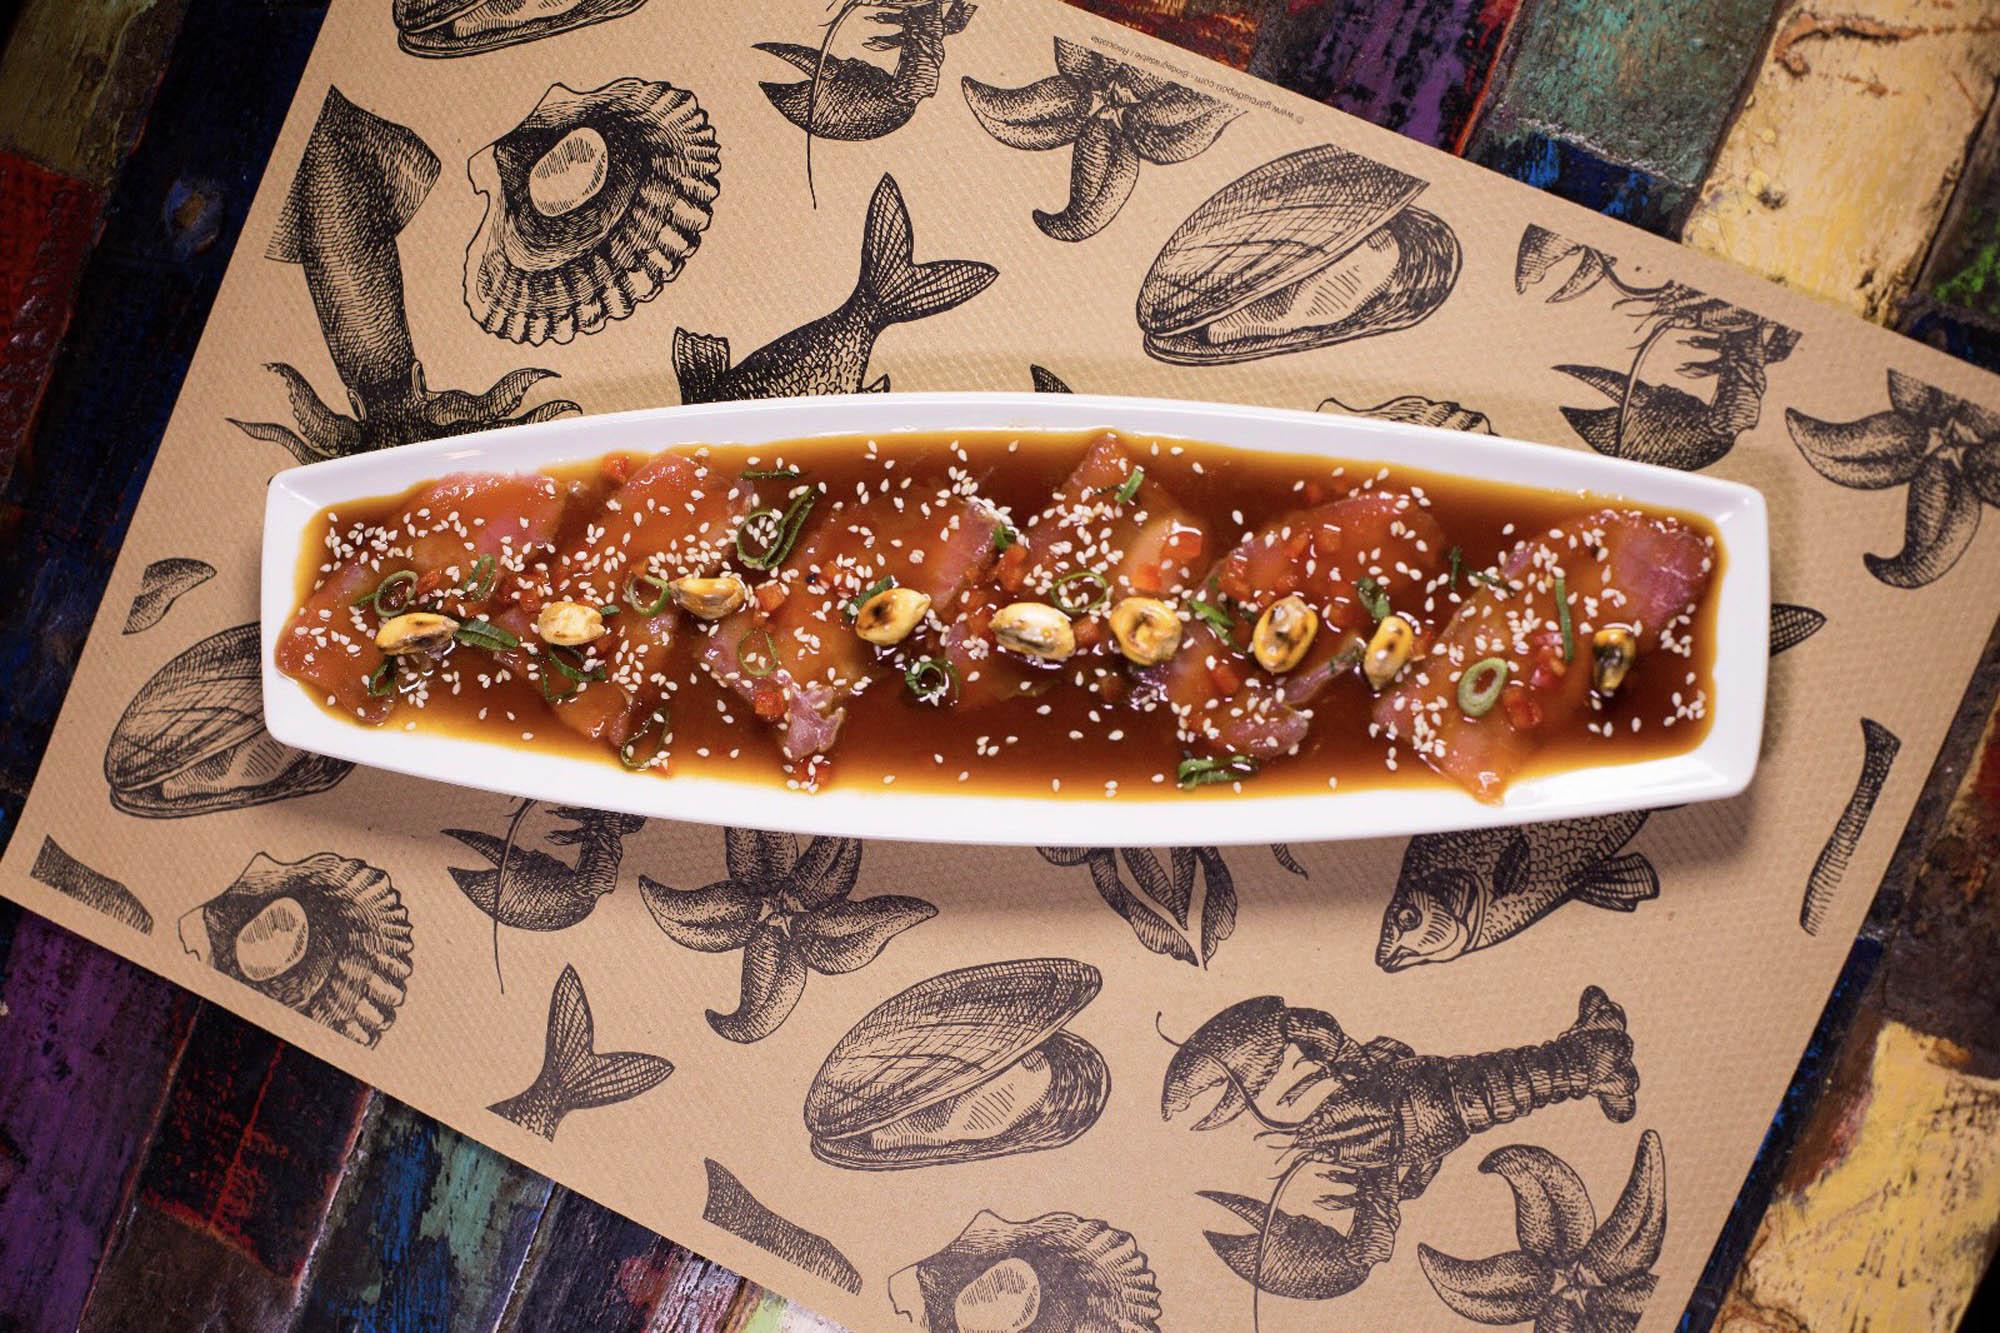 Tiradito de atún con salsa 'nikkei'. Foto: 'Cevitxef'.